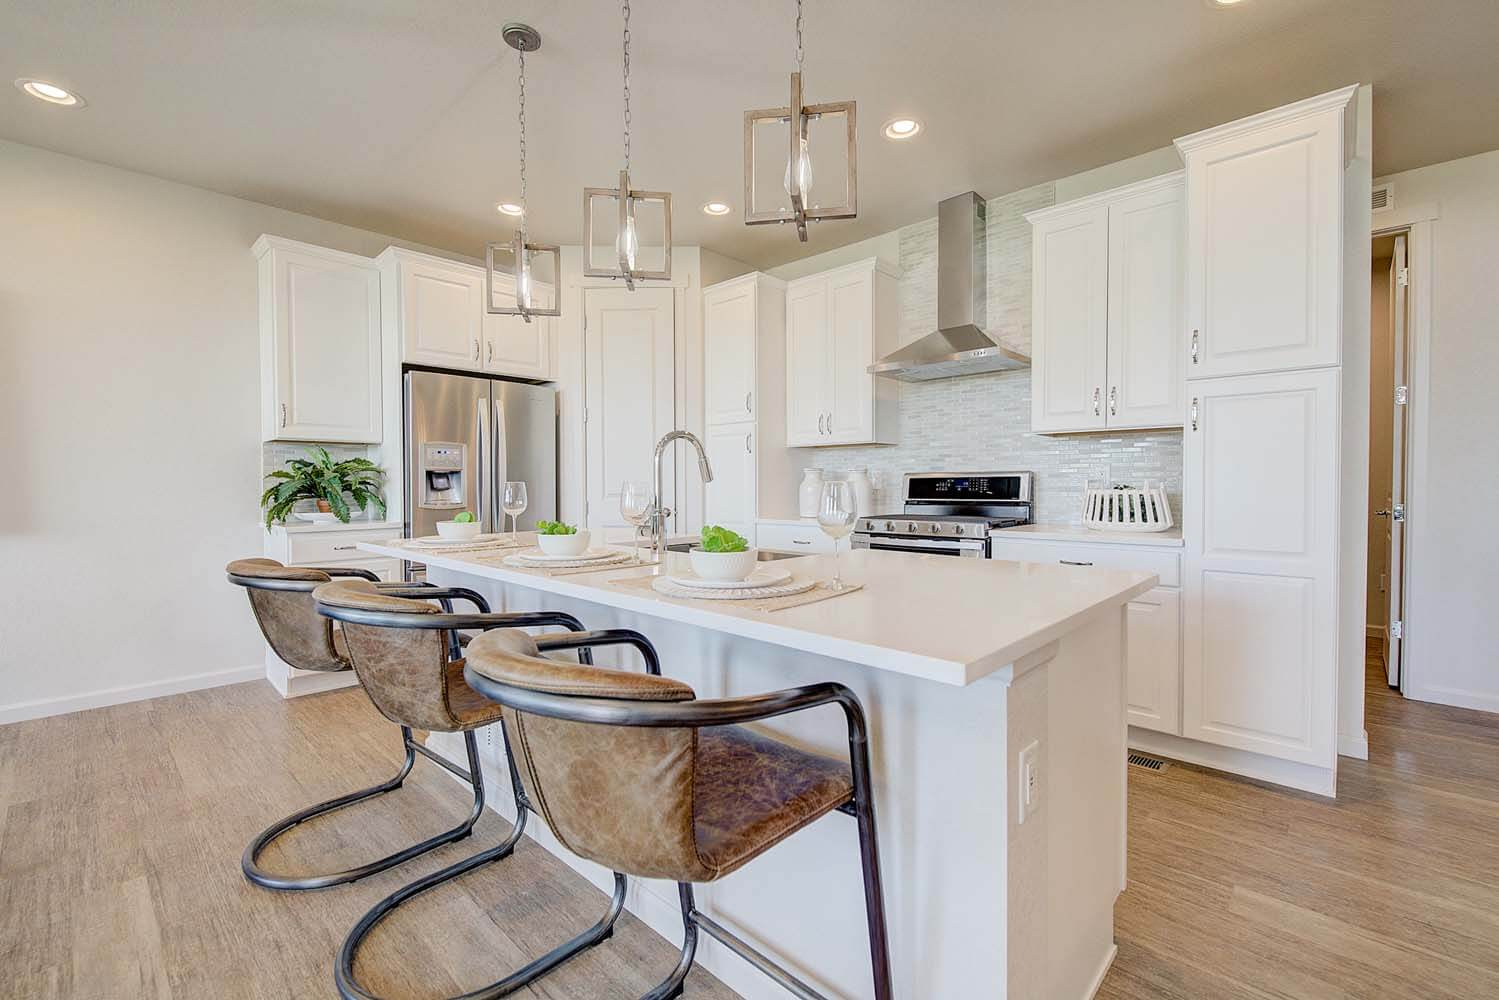 New Denver  Model Home Ponderosa in Lincoln Creek, located at 6839 Zebra Grass Lane, Parker, CO Built By Cardel Homes Denver